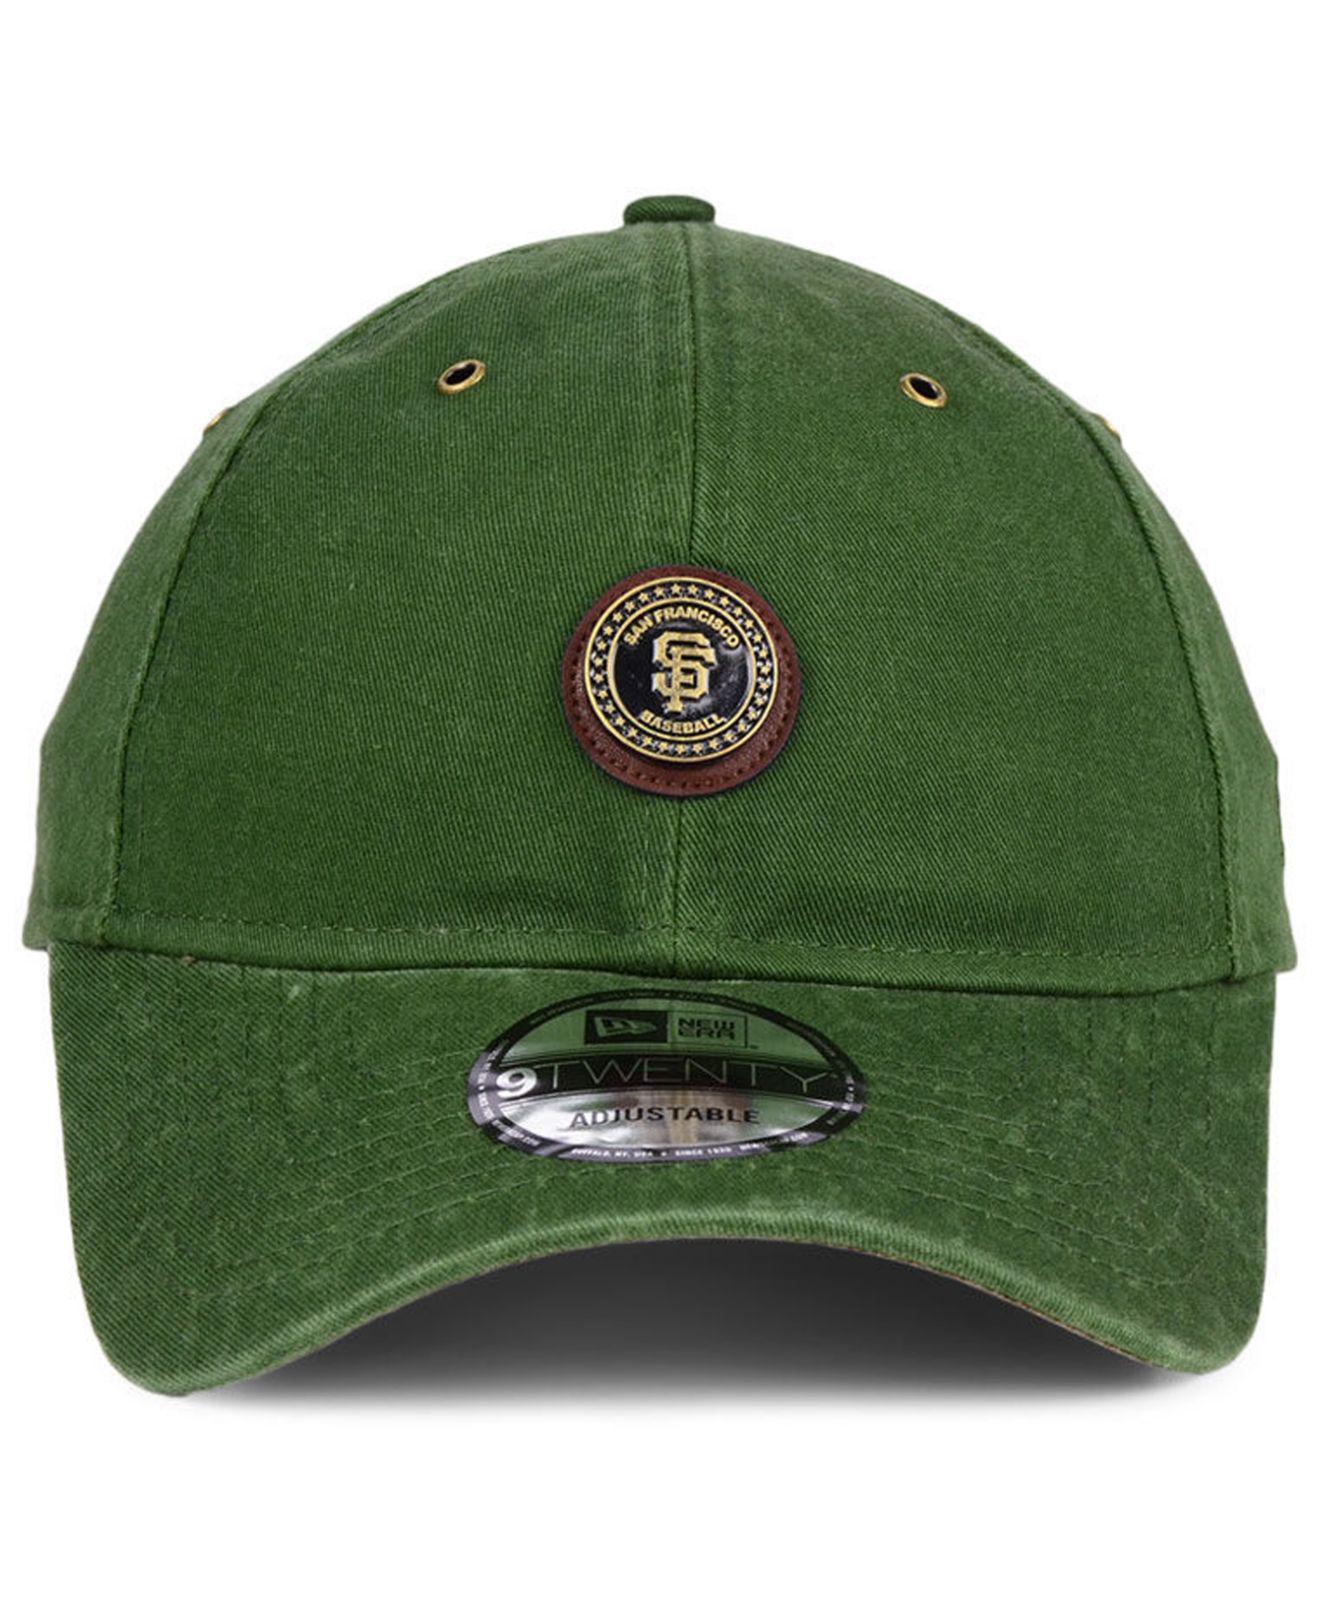 ... huge sale 14ad6 5ca58 Lyst - Ktz San Francisco Giants Coin 9twenty Cap  in Green fo ... 6727c3873